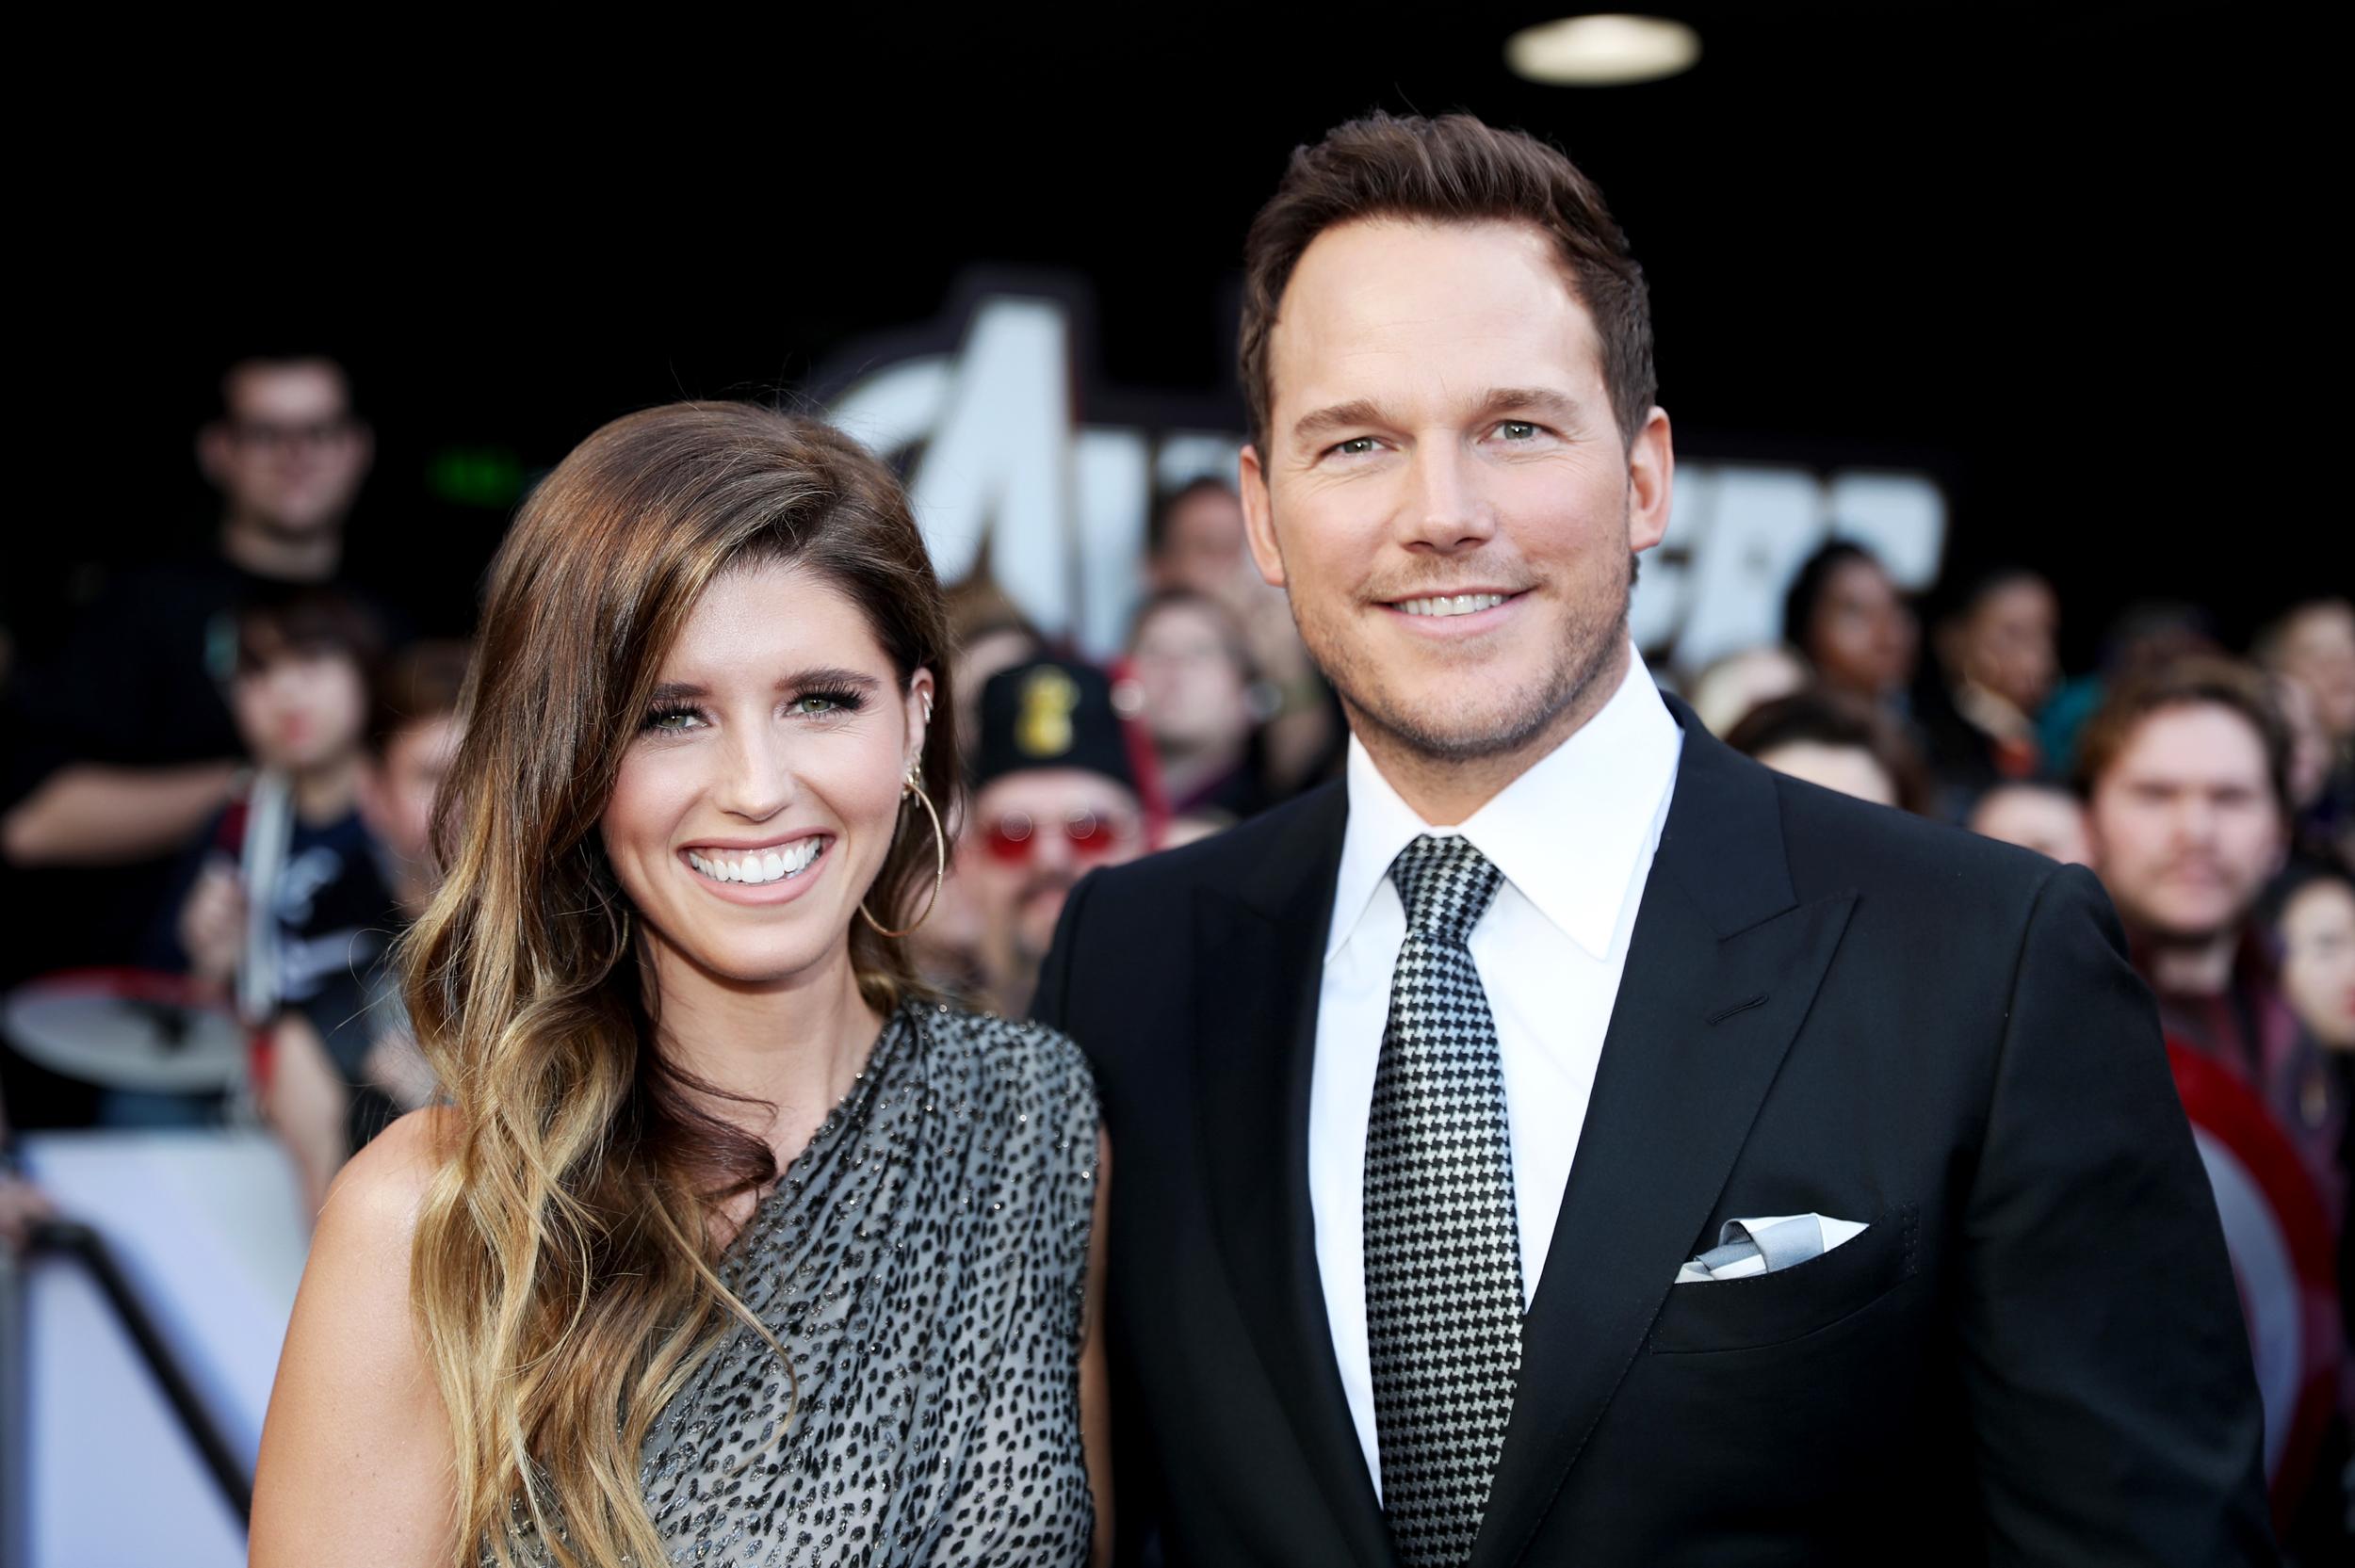 Chris Pratt and Katherine Schwarzenegger announce marriage, share